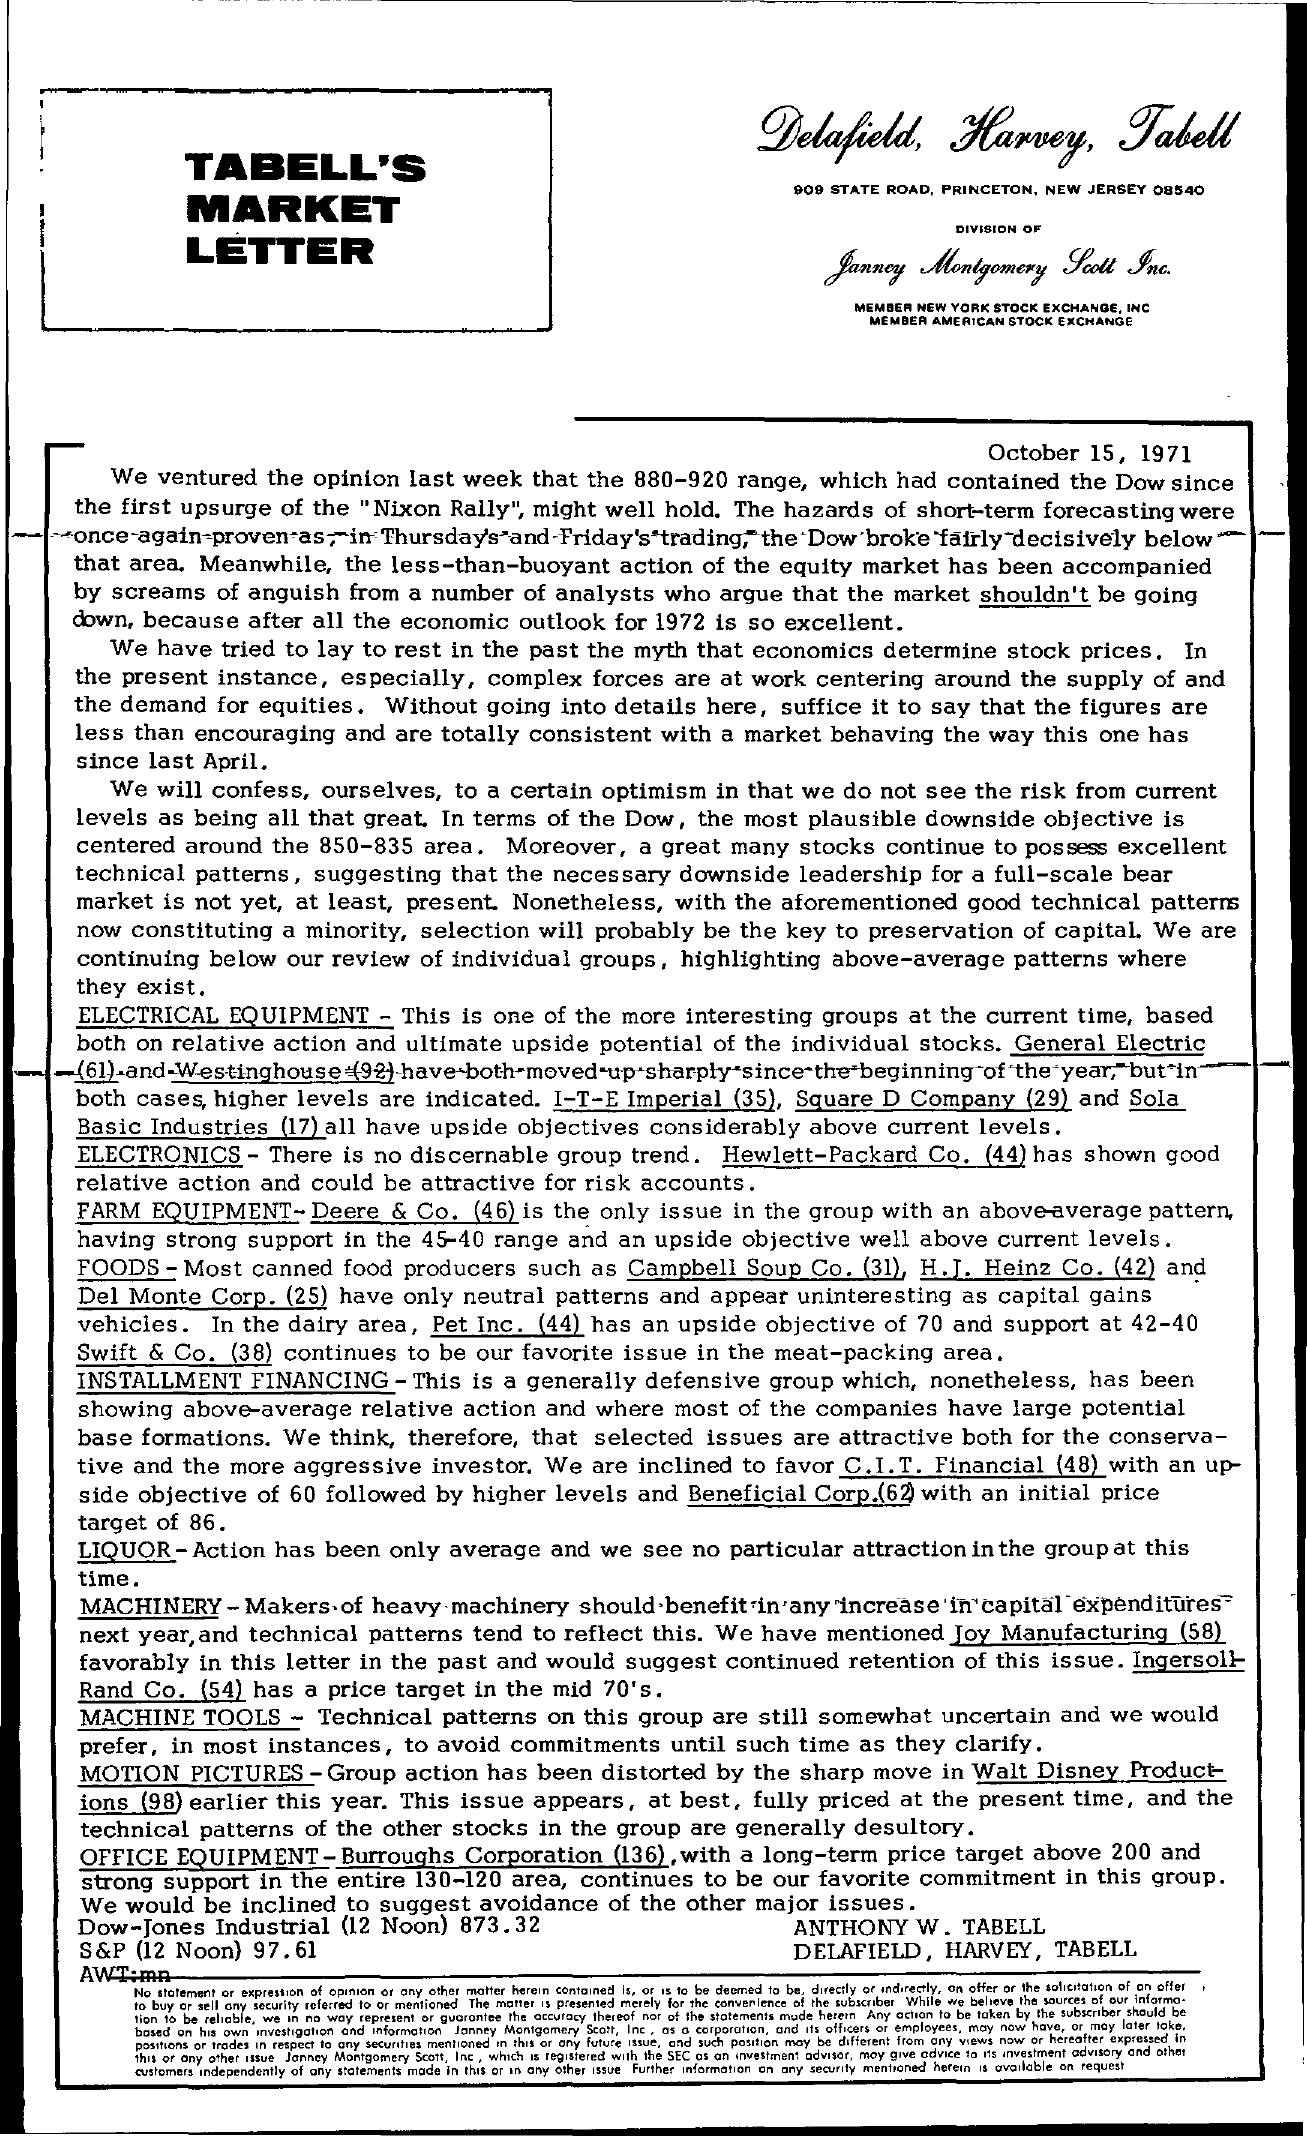 Tabell's Market Letter - October 15, 1971